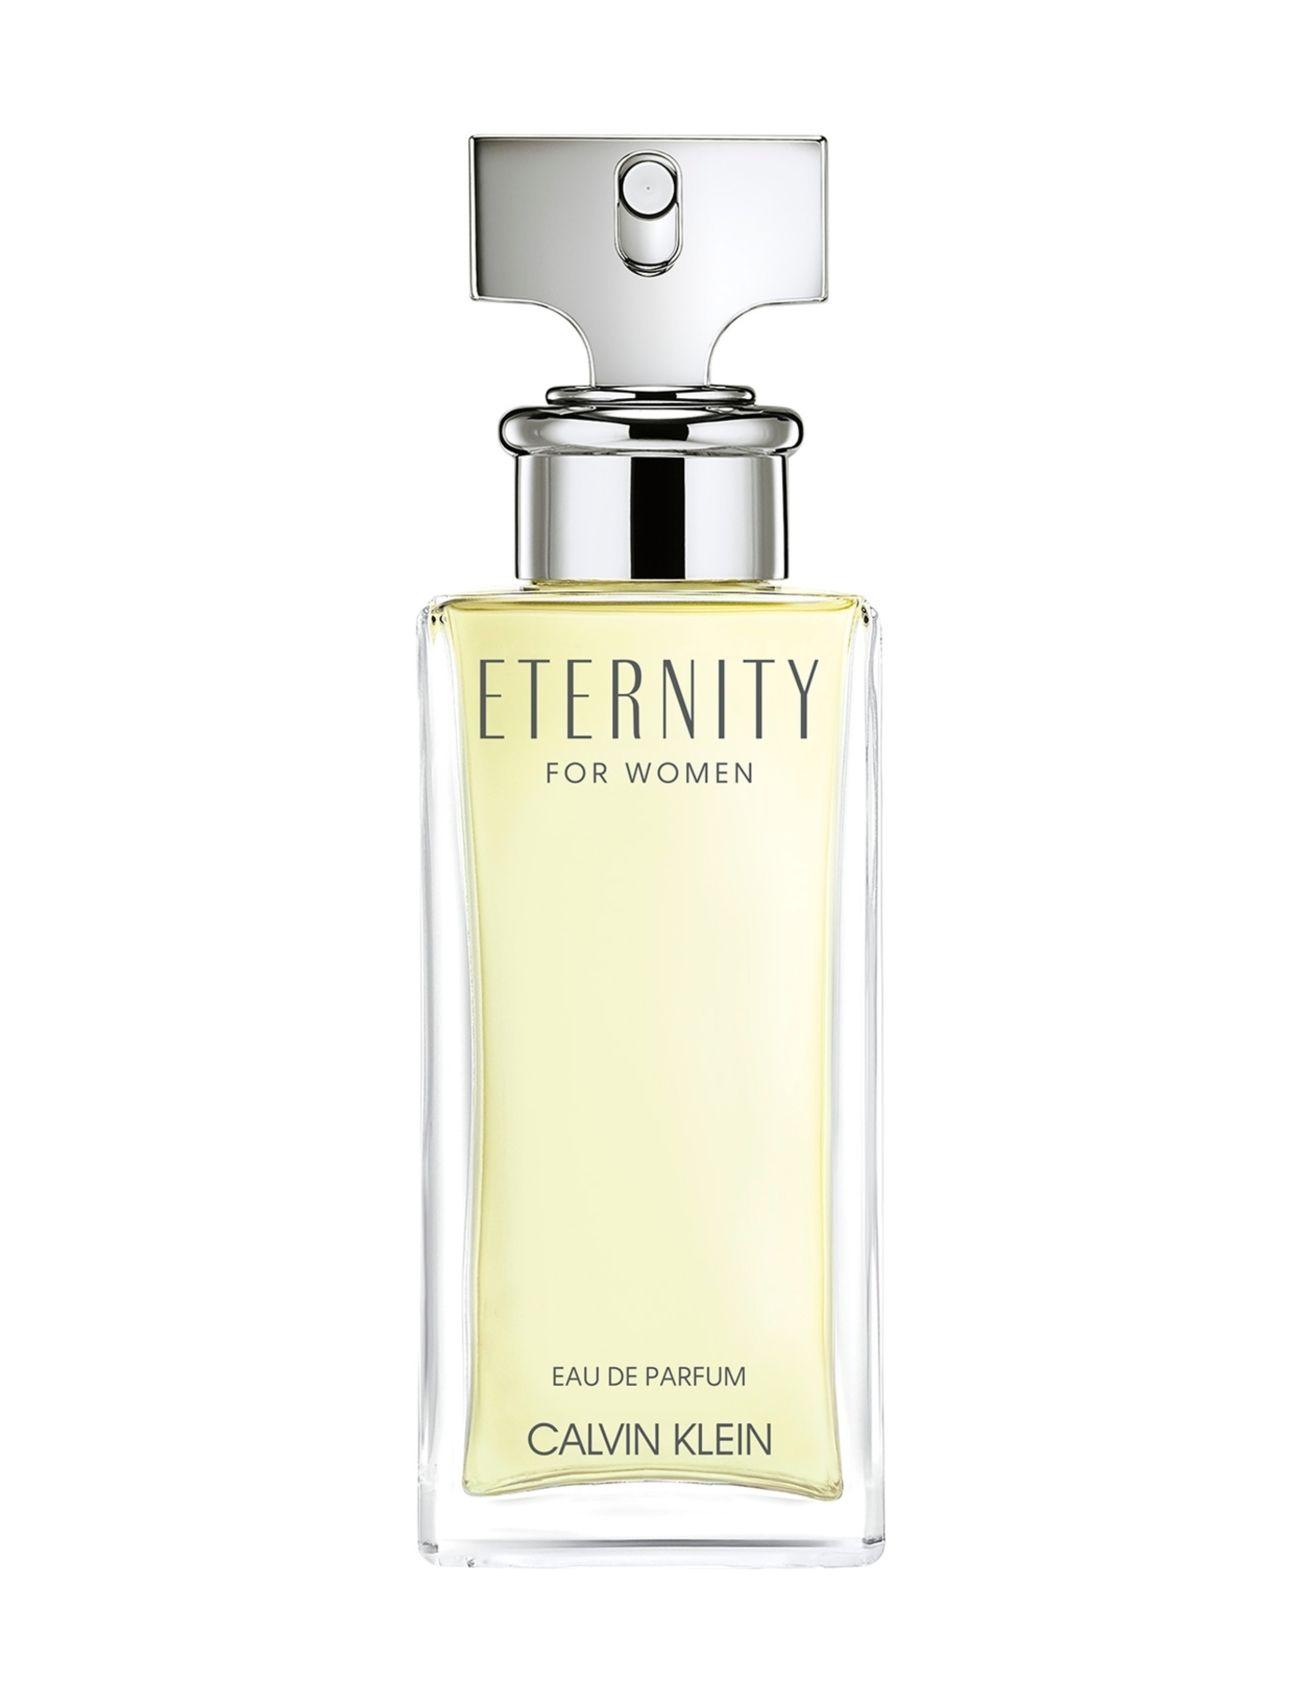 calvin klein fragrance Calvin klein eternity eau de parfum på boozt.com dk